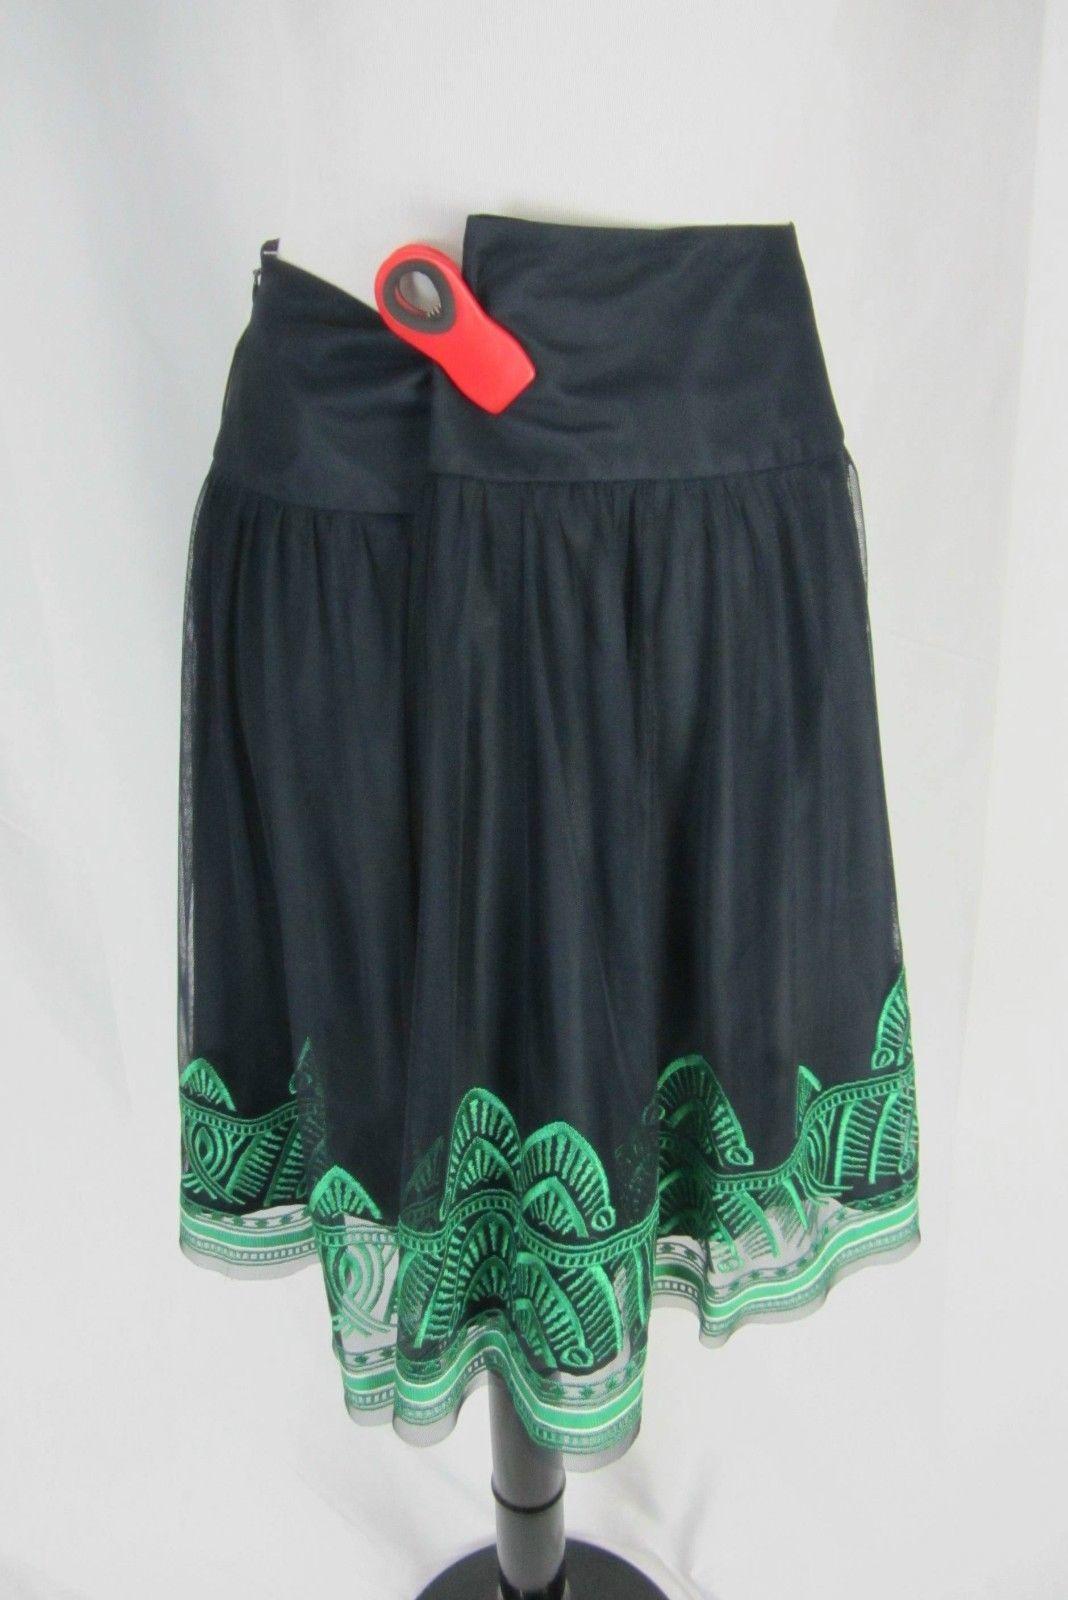 Peter Nygard Skirt size 10 Petite Navy Netting Green Embroidery Knee Modest Full